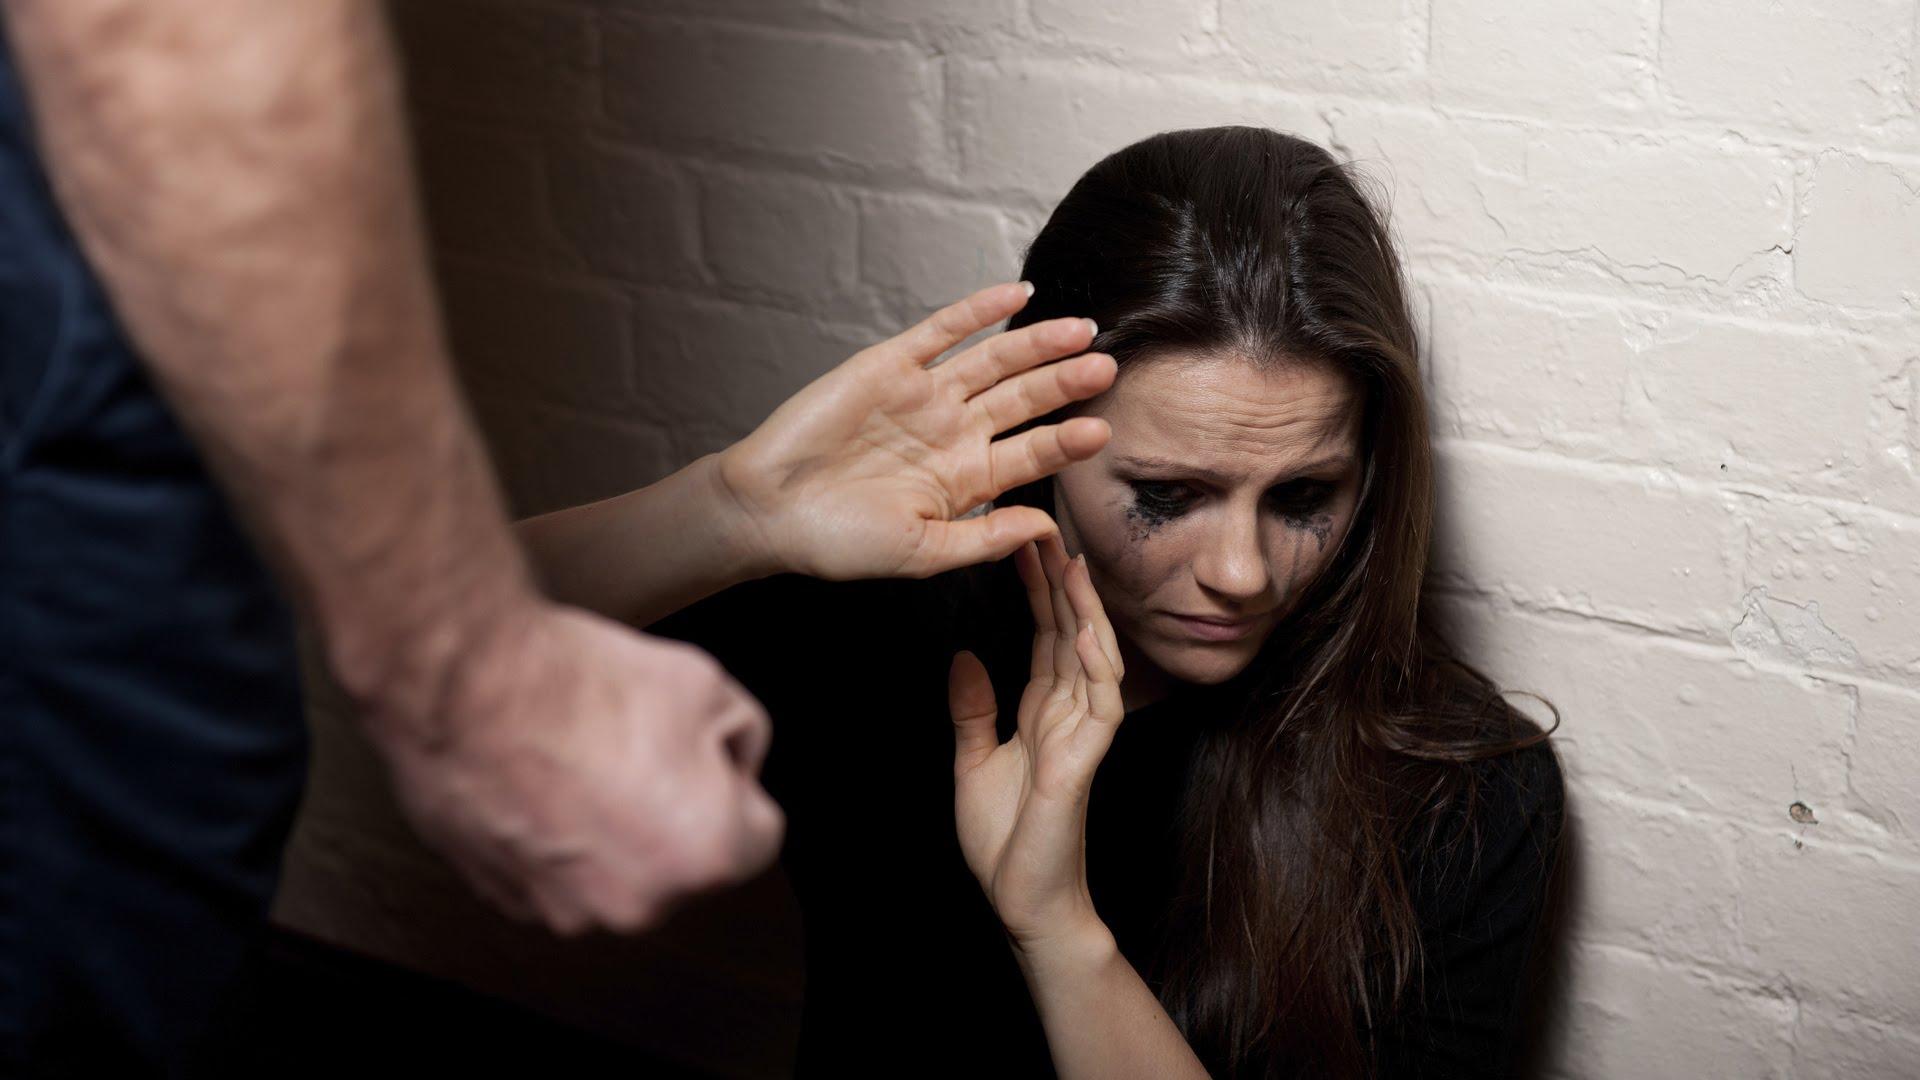 Colorado Se Suma A Programa De Prevención De Violencia Doméstica